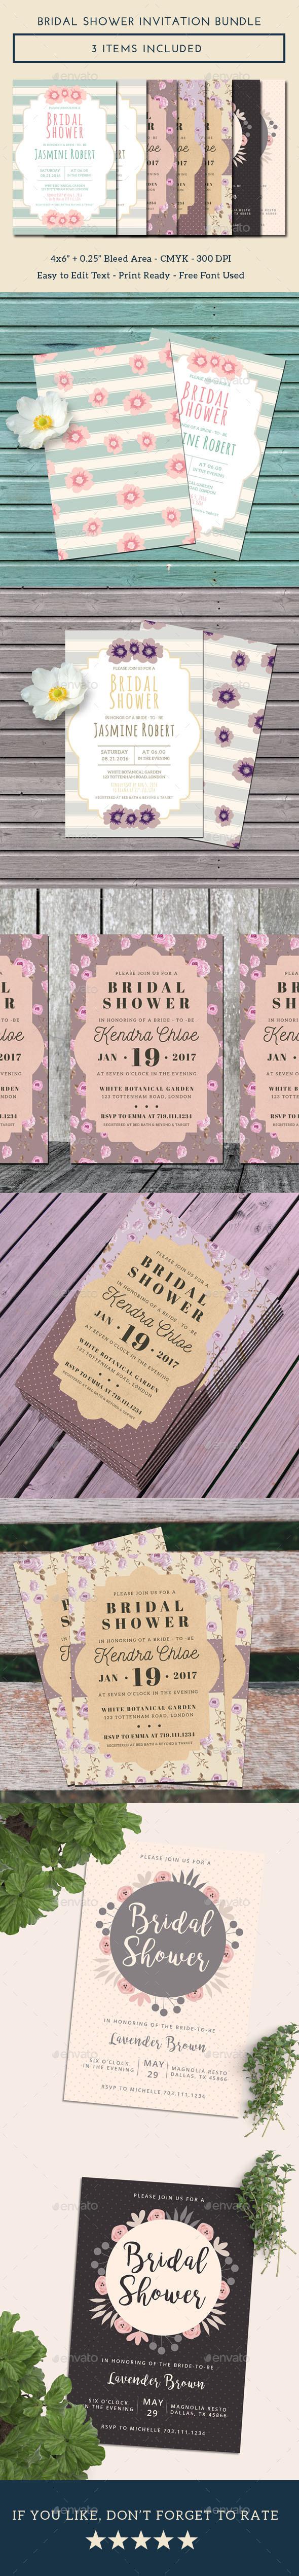 Bridal Shower Invitation Bundle - Weddings Cards & Invites